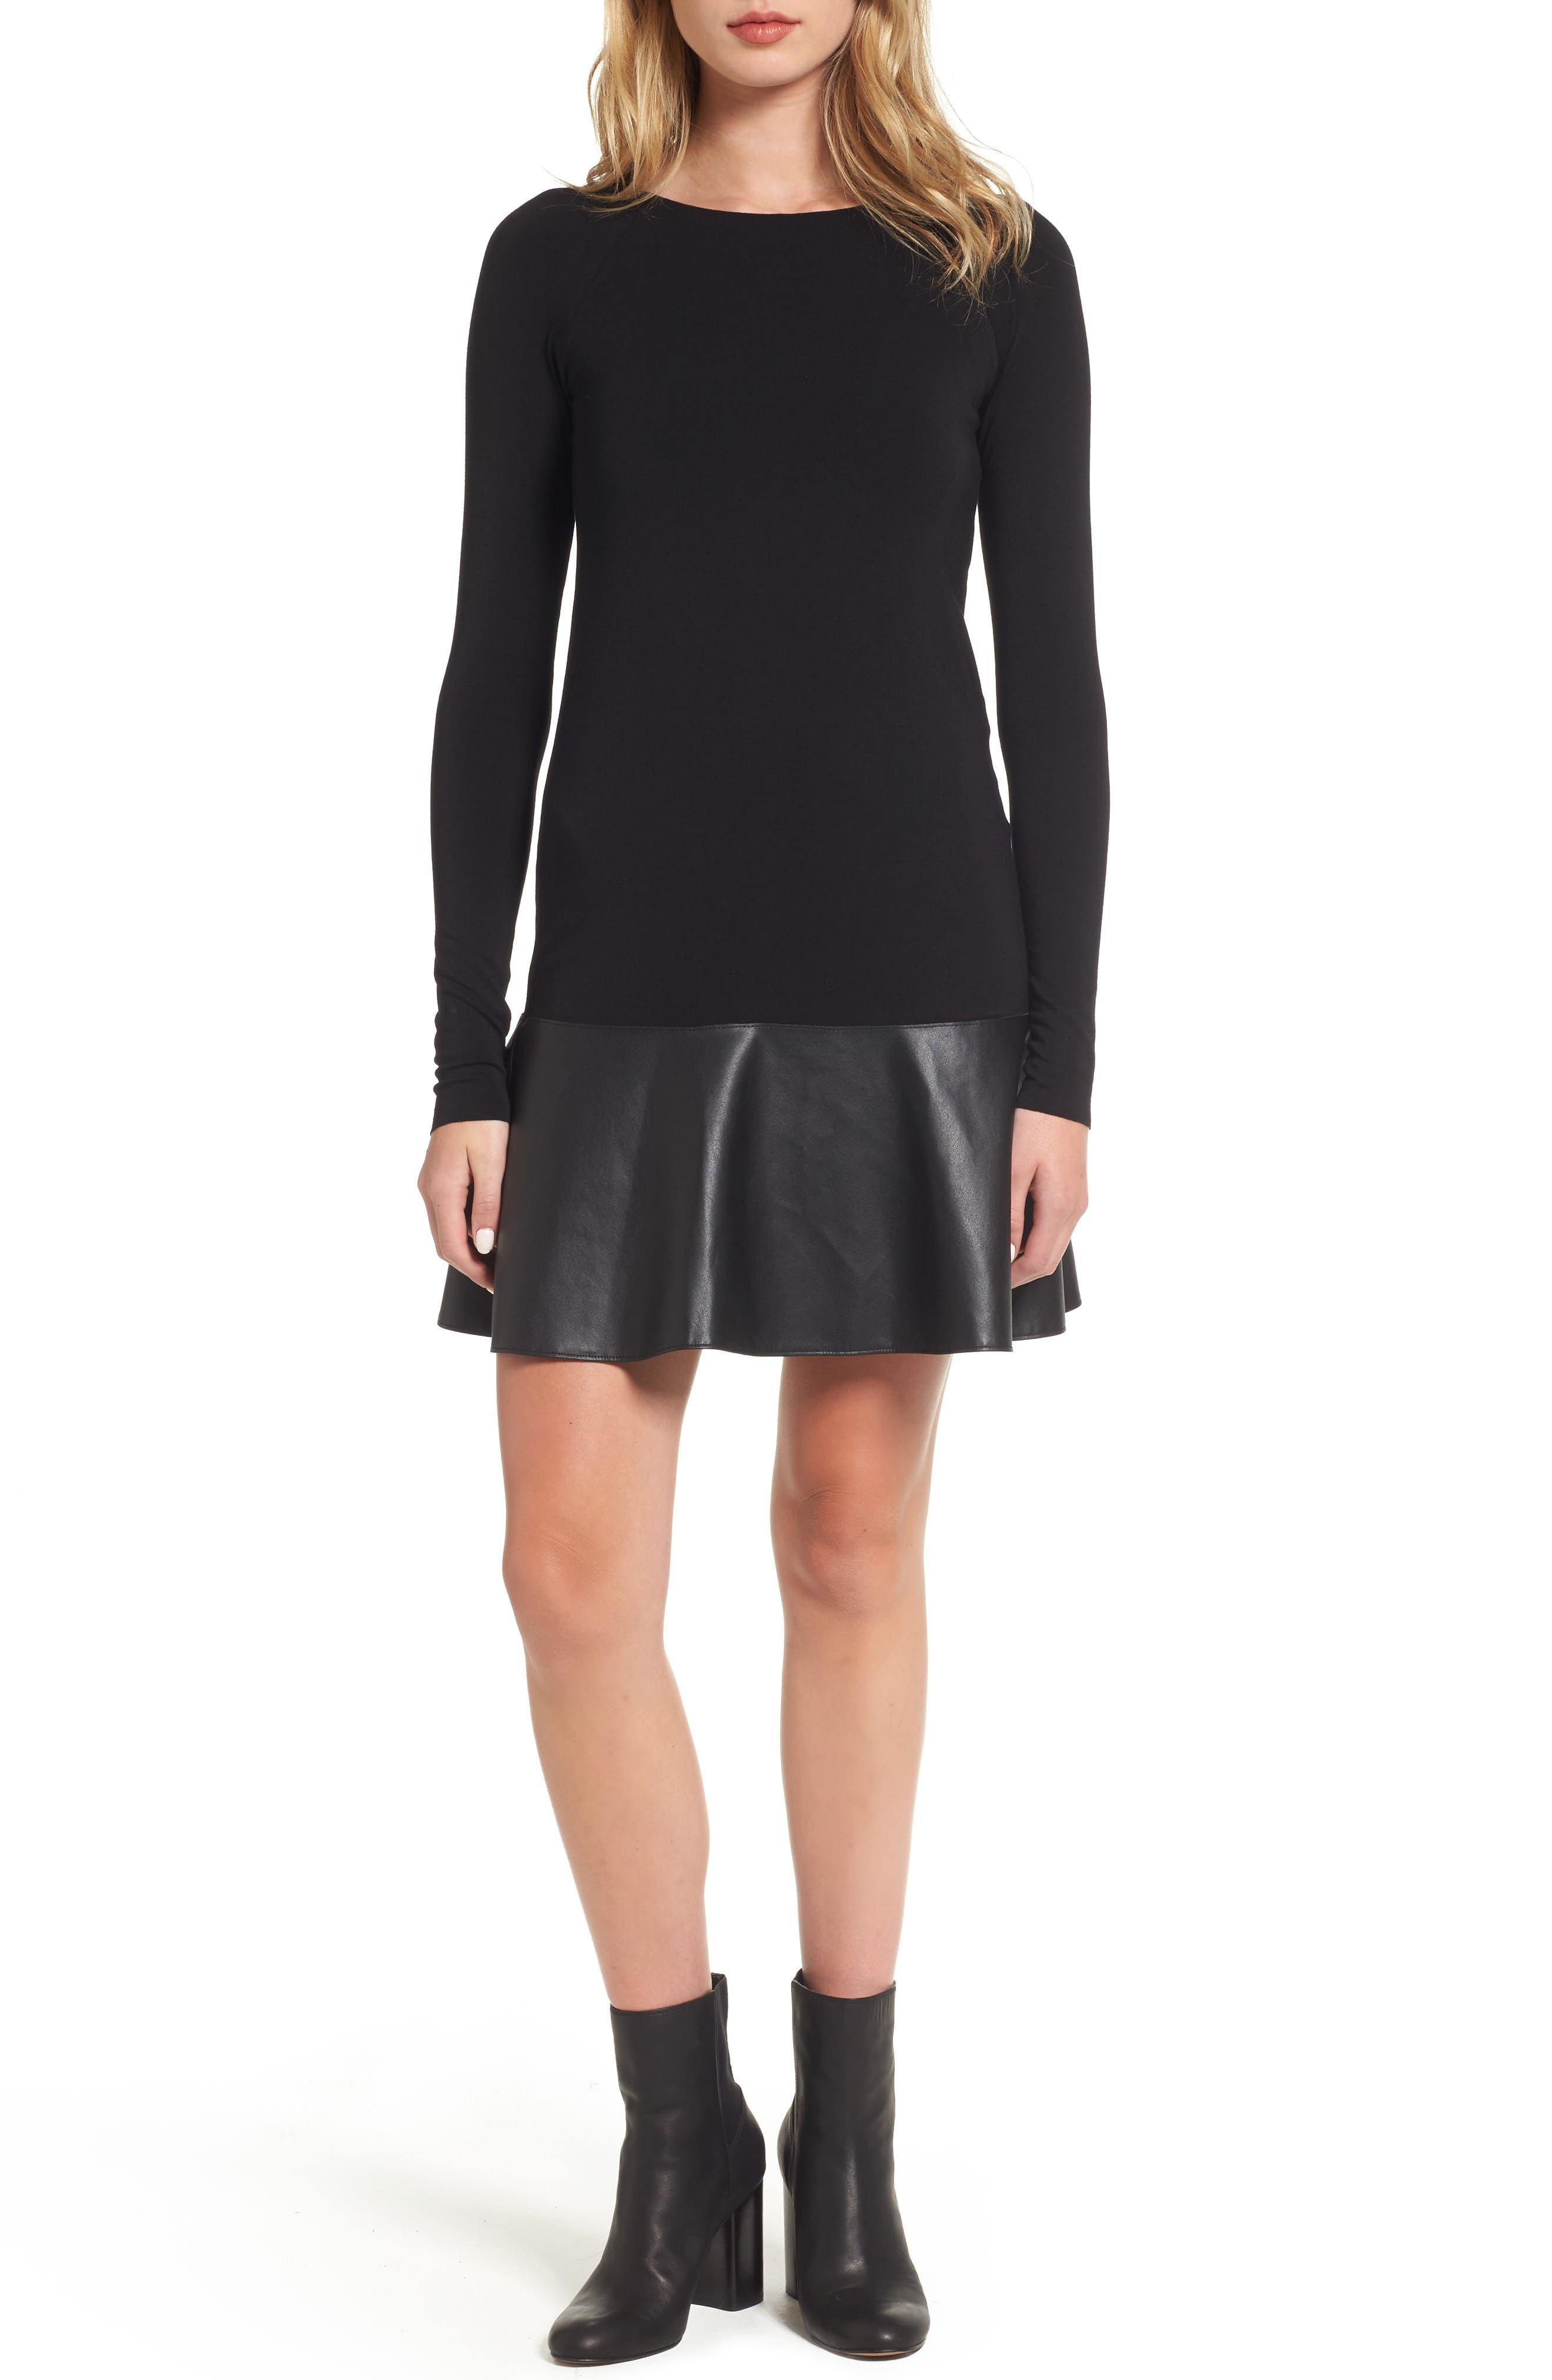 Main Image - Bailey 44 Georgina Faux Leather & Jersey Dress